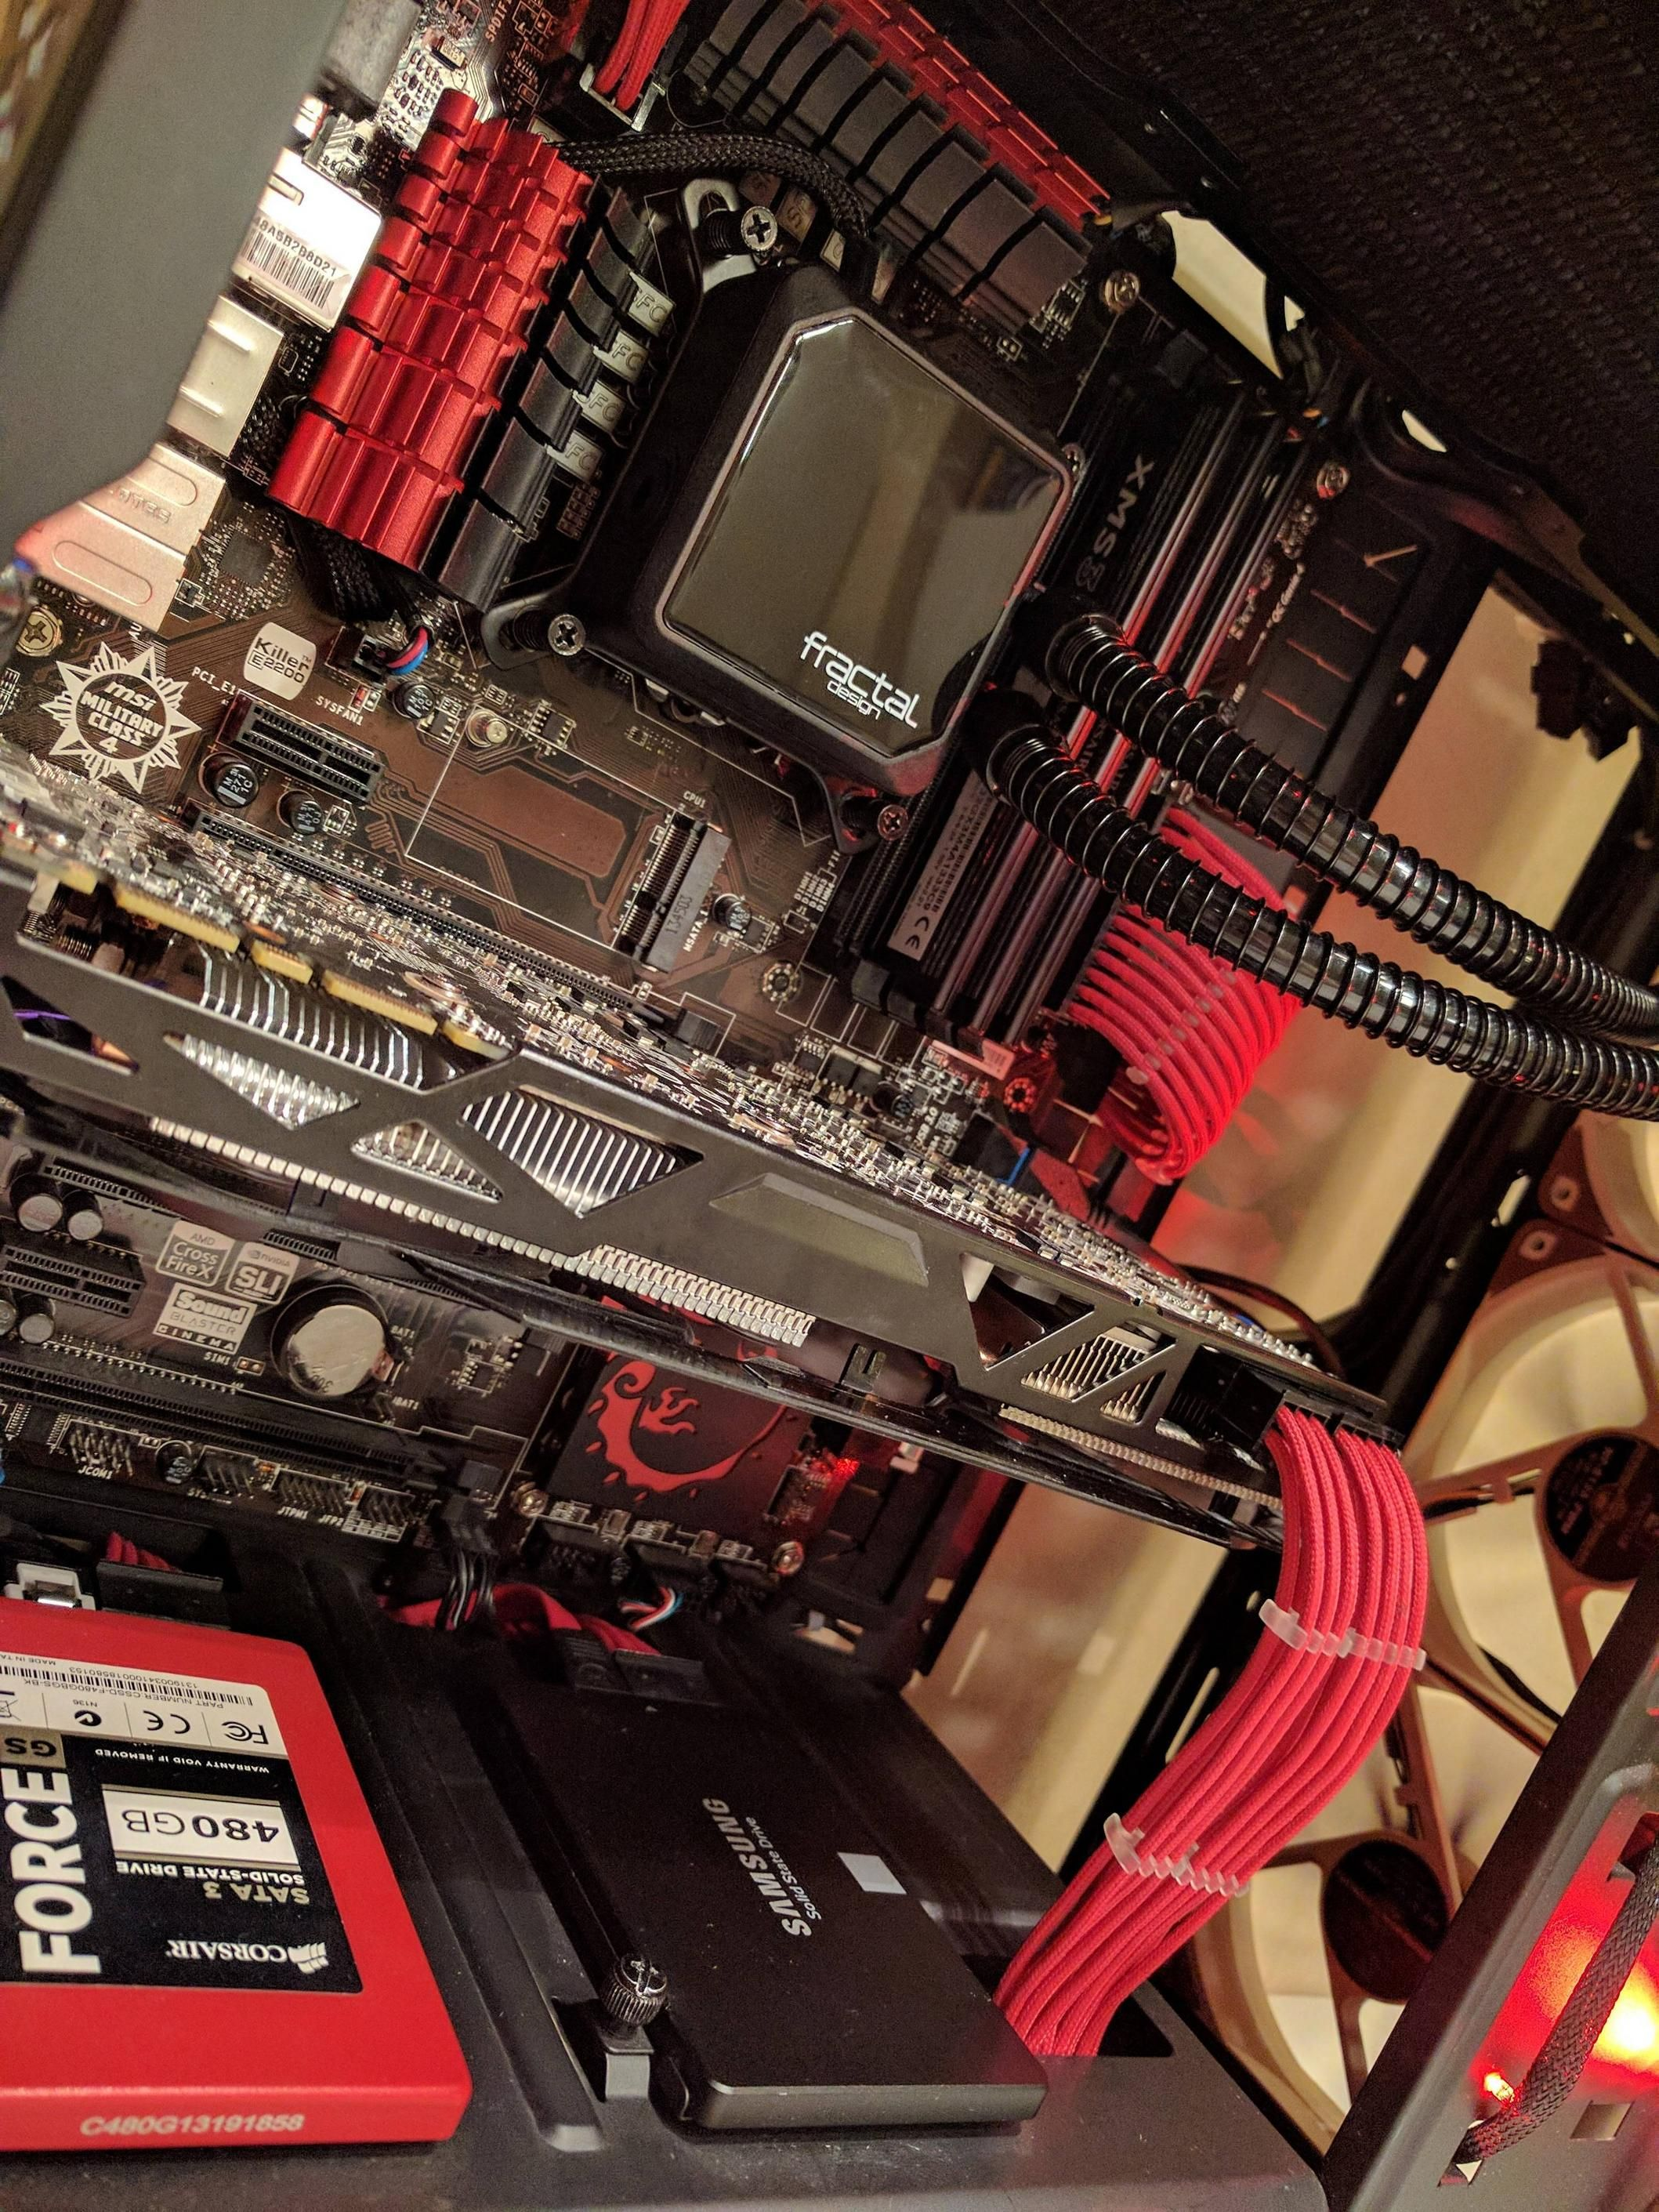 Red Black Cable Management Cable Management Cable Management